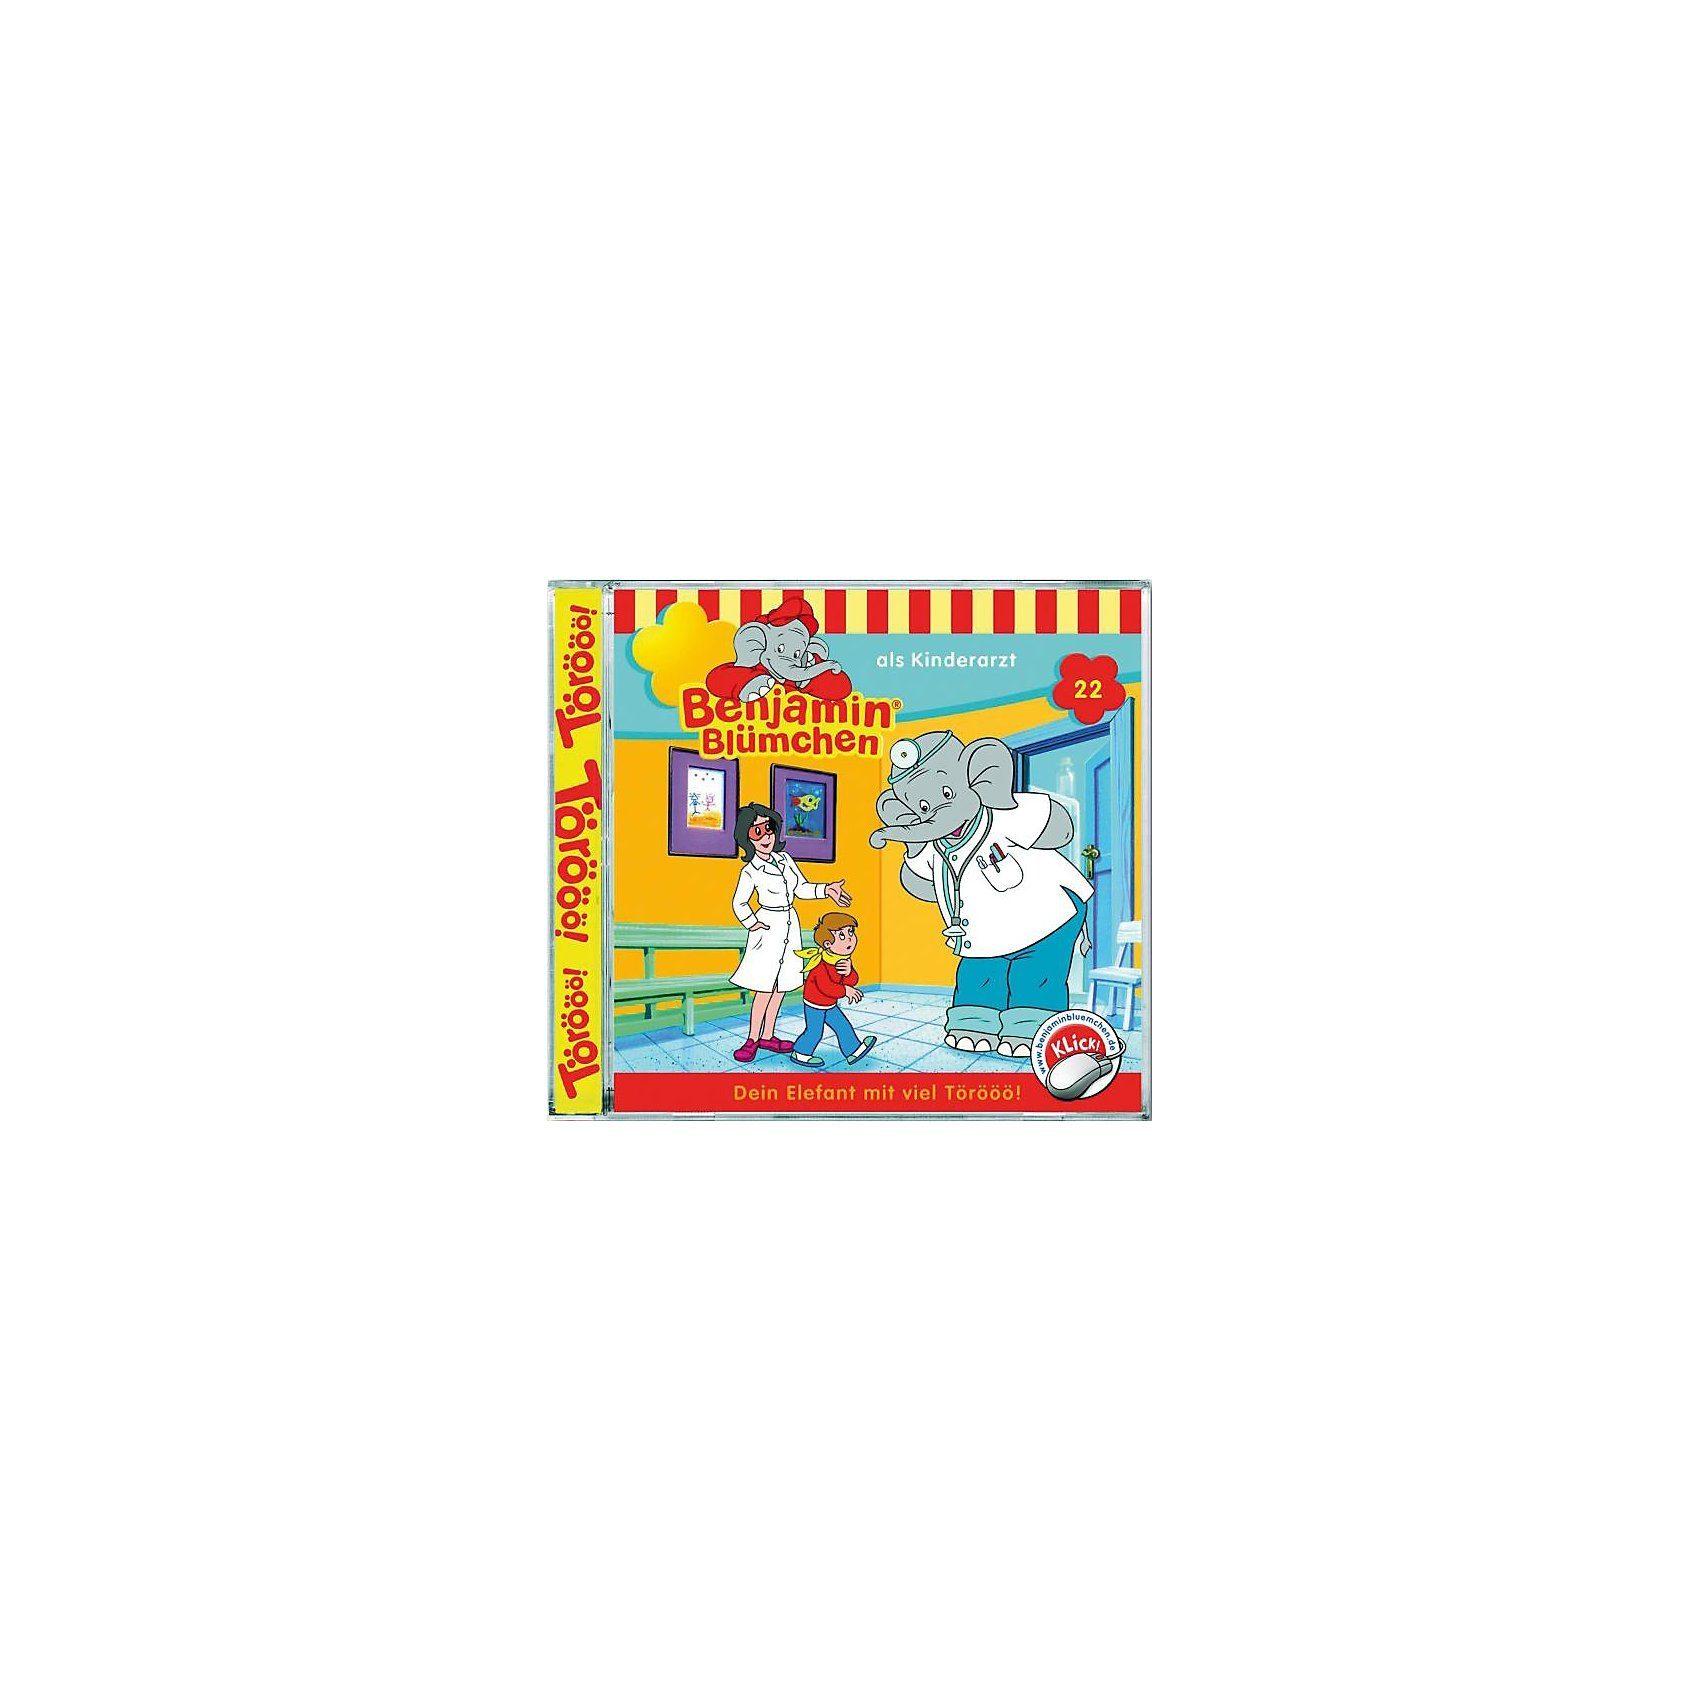 Kiddinx CD Benjamin Blümchen 22 - als Kinderarzt